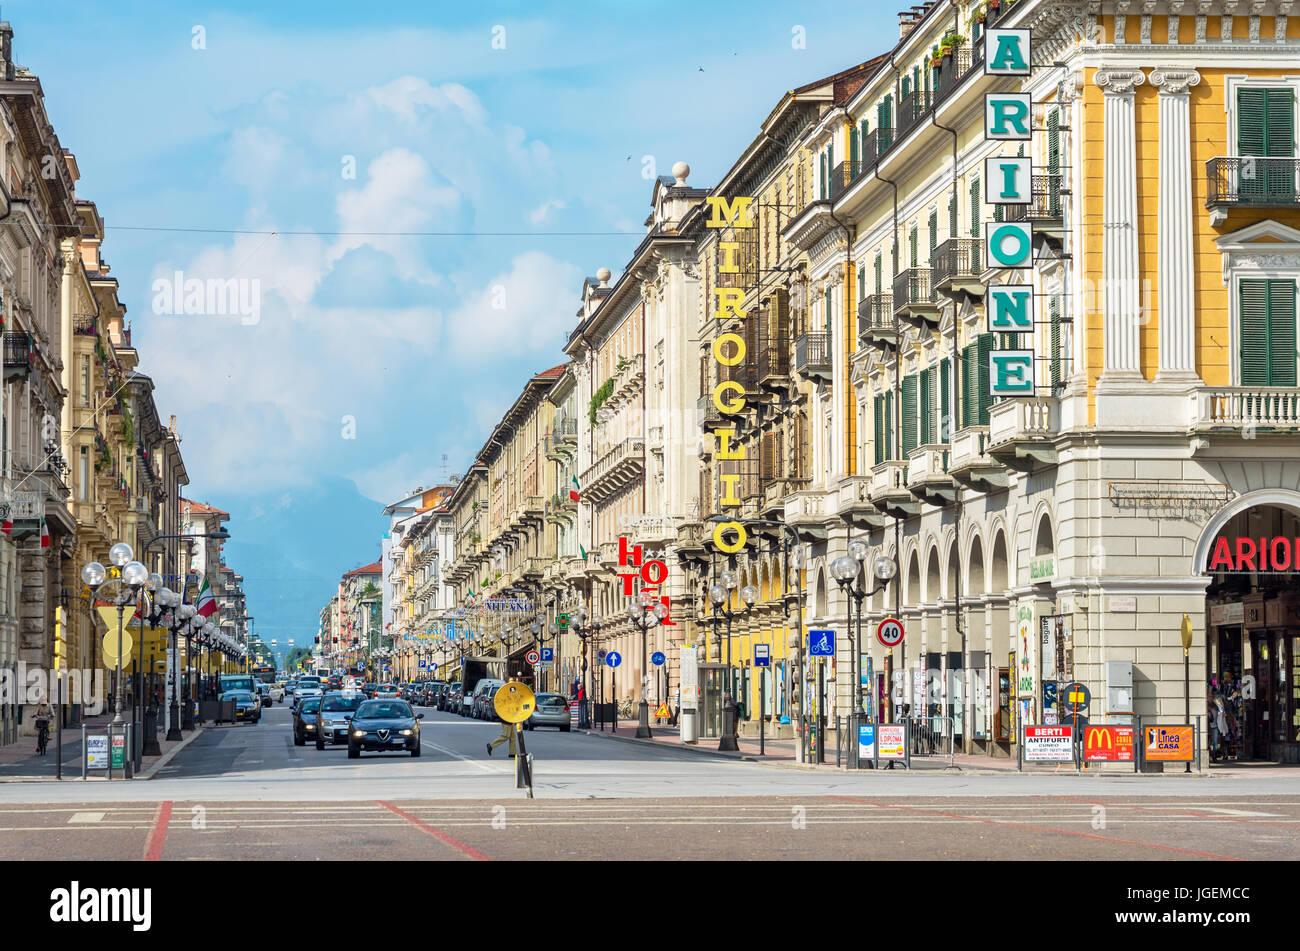 View along Corsa Nizza street toward Alps. Cuneo, Italy - Stock Image